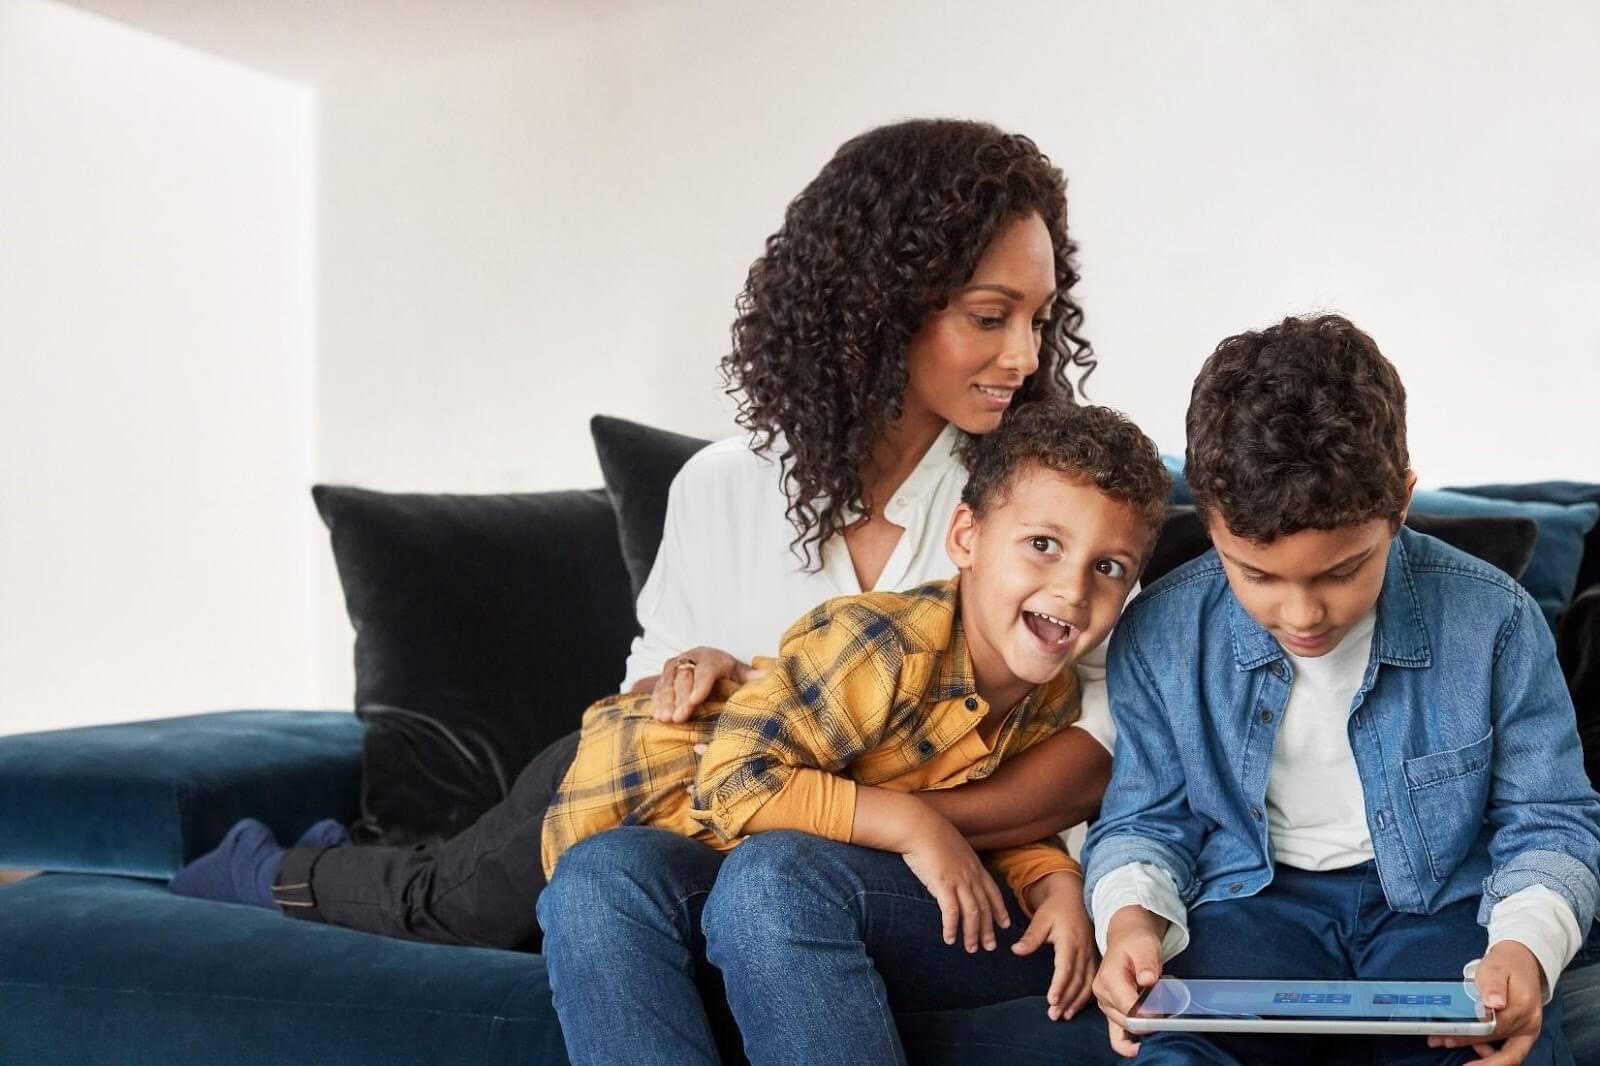 Microsoft's Family Safety App